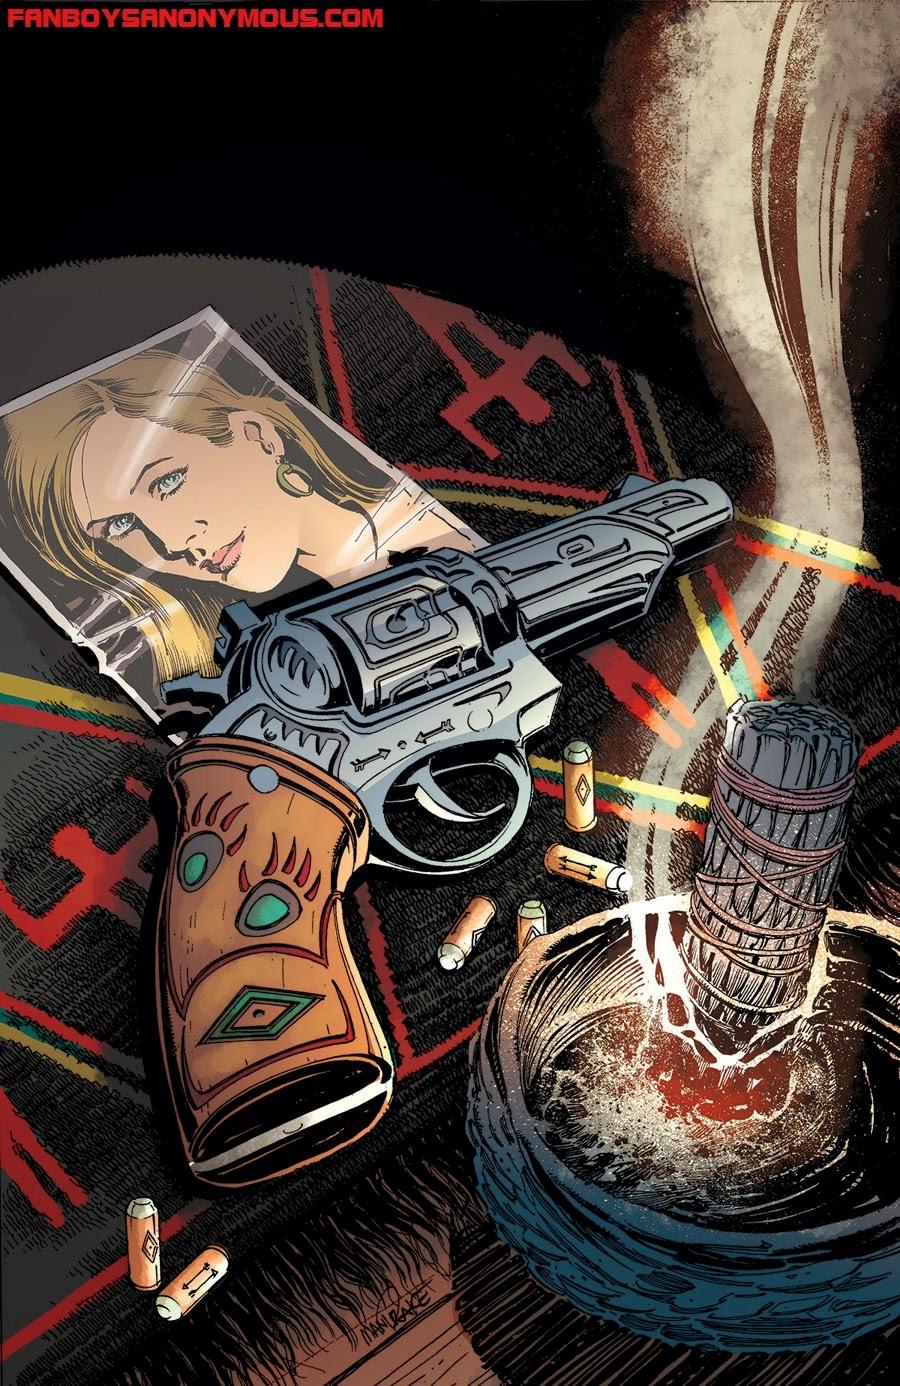 Lance Henriksen Aliens Bishop actor comic book writer